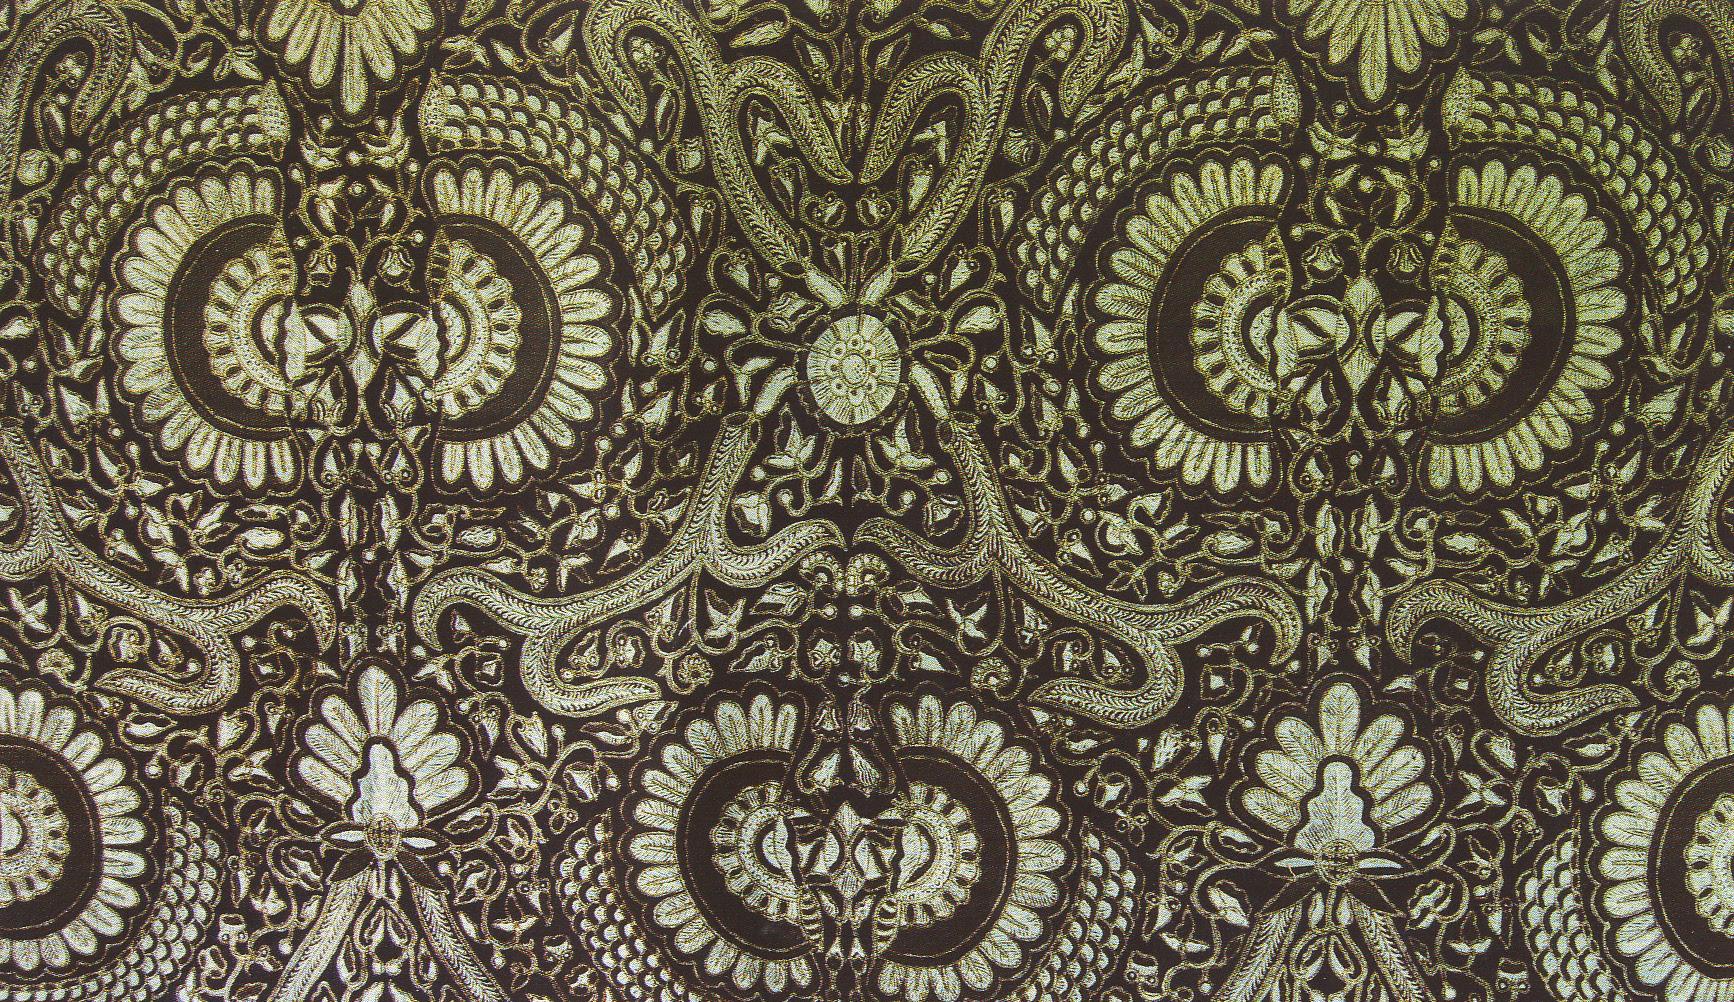 Batik Painting Fabric Artwork